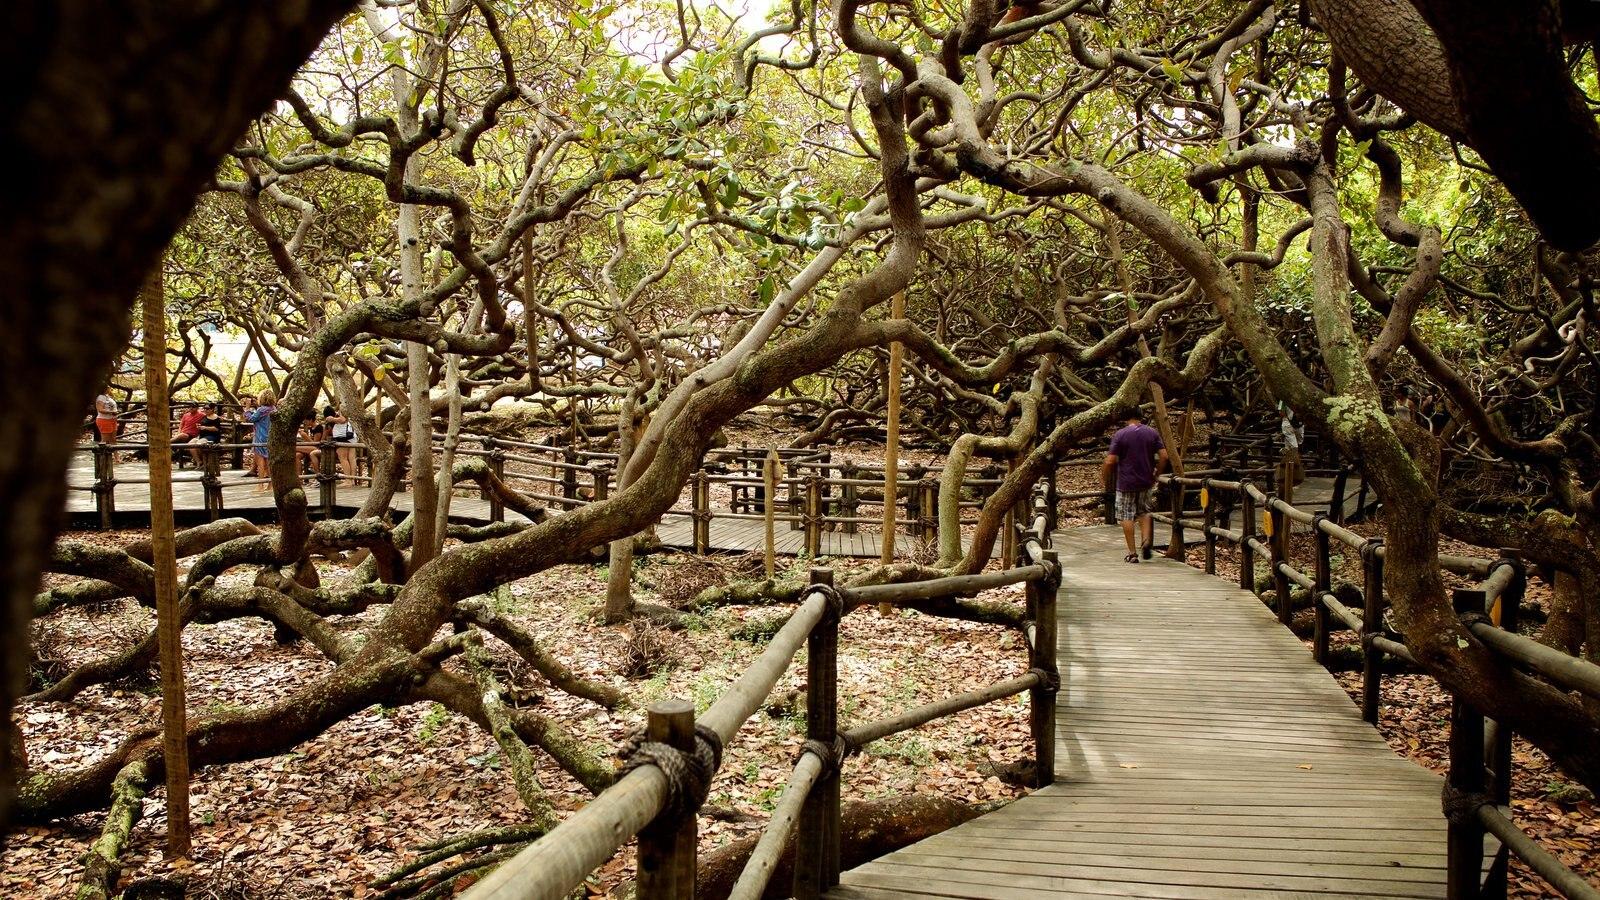 Cajueiro de Pirangi caracterizando um jardim